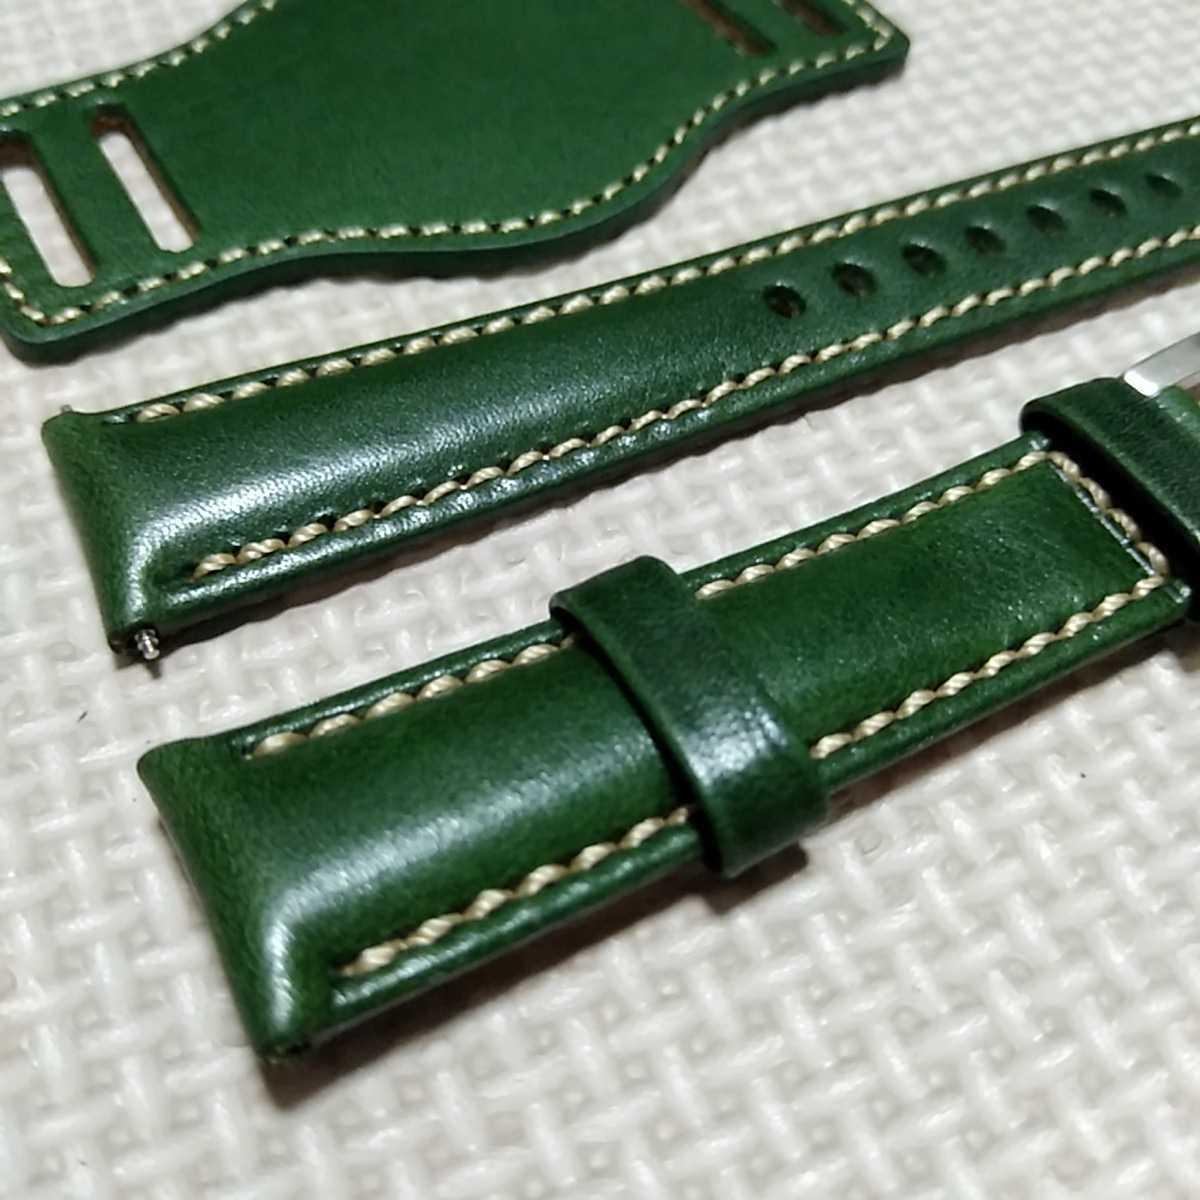 No52 ブンド BUND 本革レザーベルト 腕時計ベルト 交換用ストラップ グリーン 18mm 未使用 高品質 ドイツパイロット 空軍_画像7